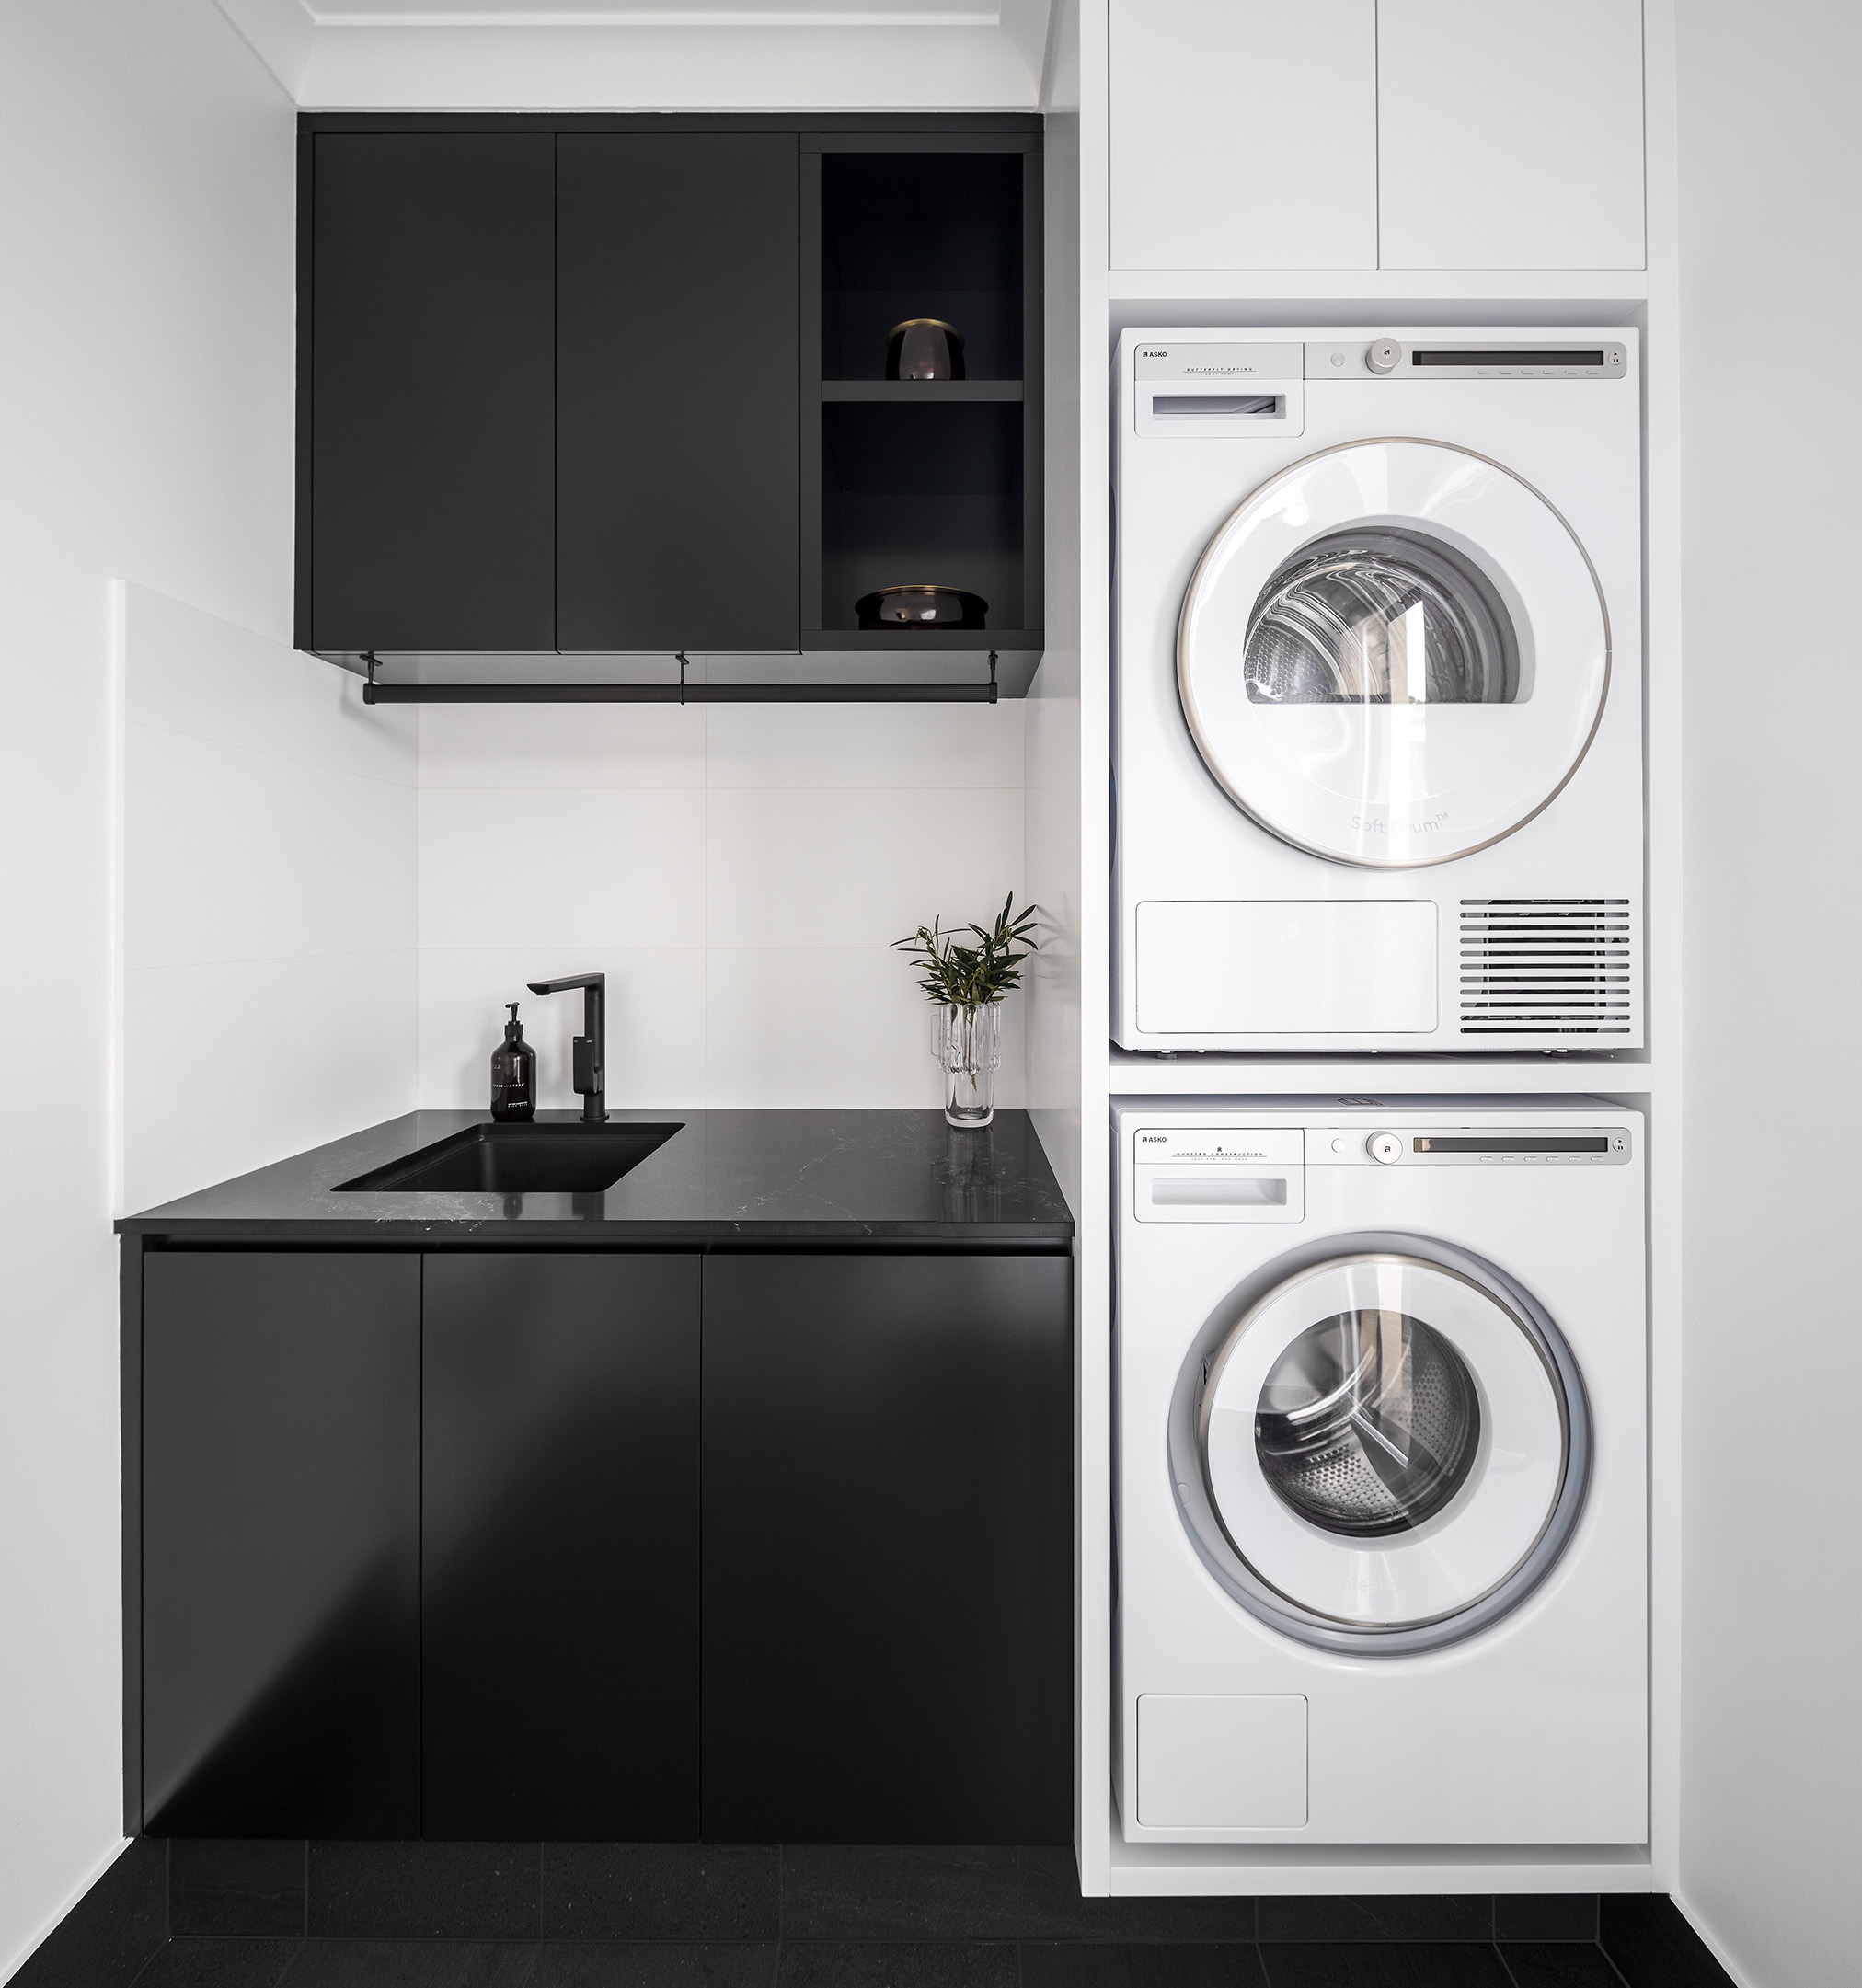 Monochrome Laundry overview